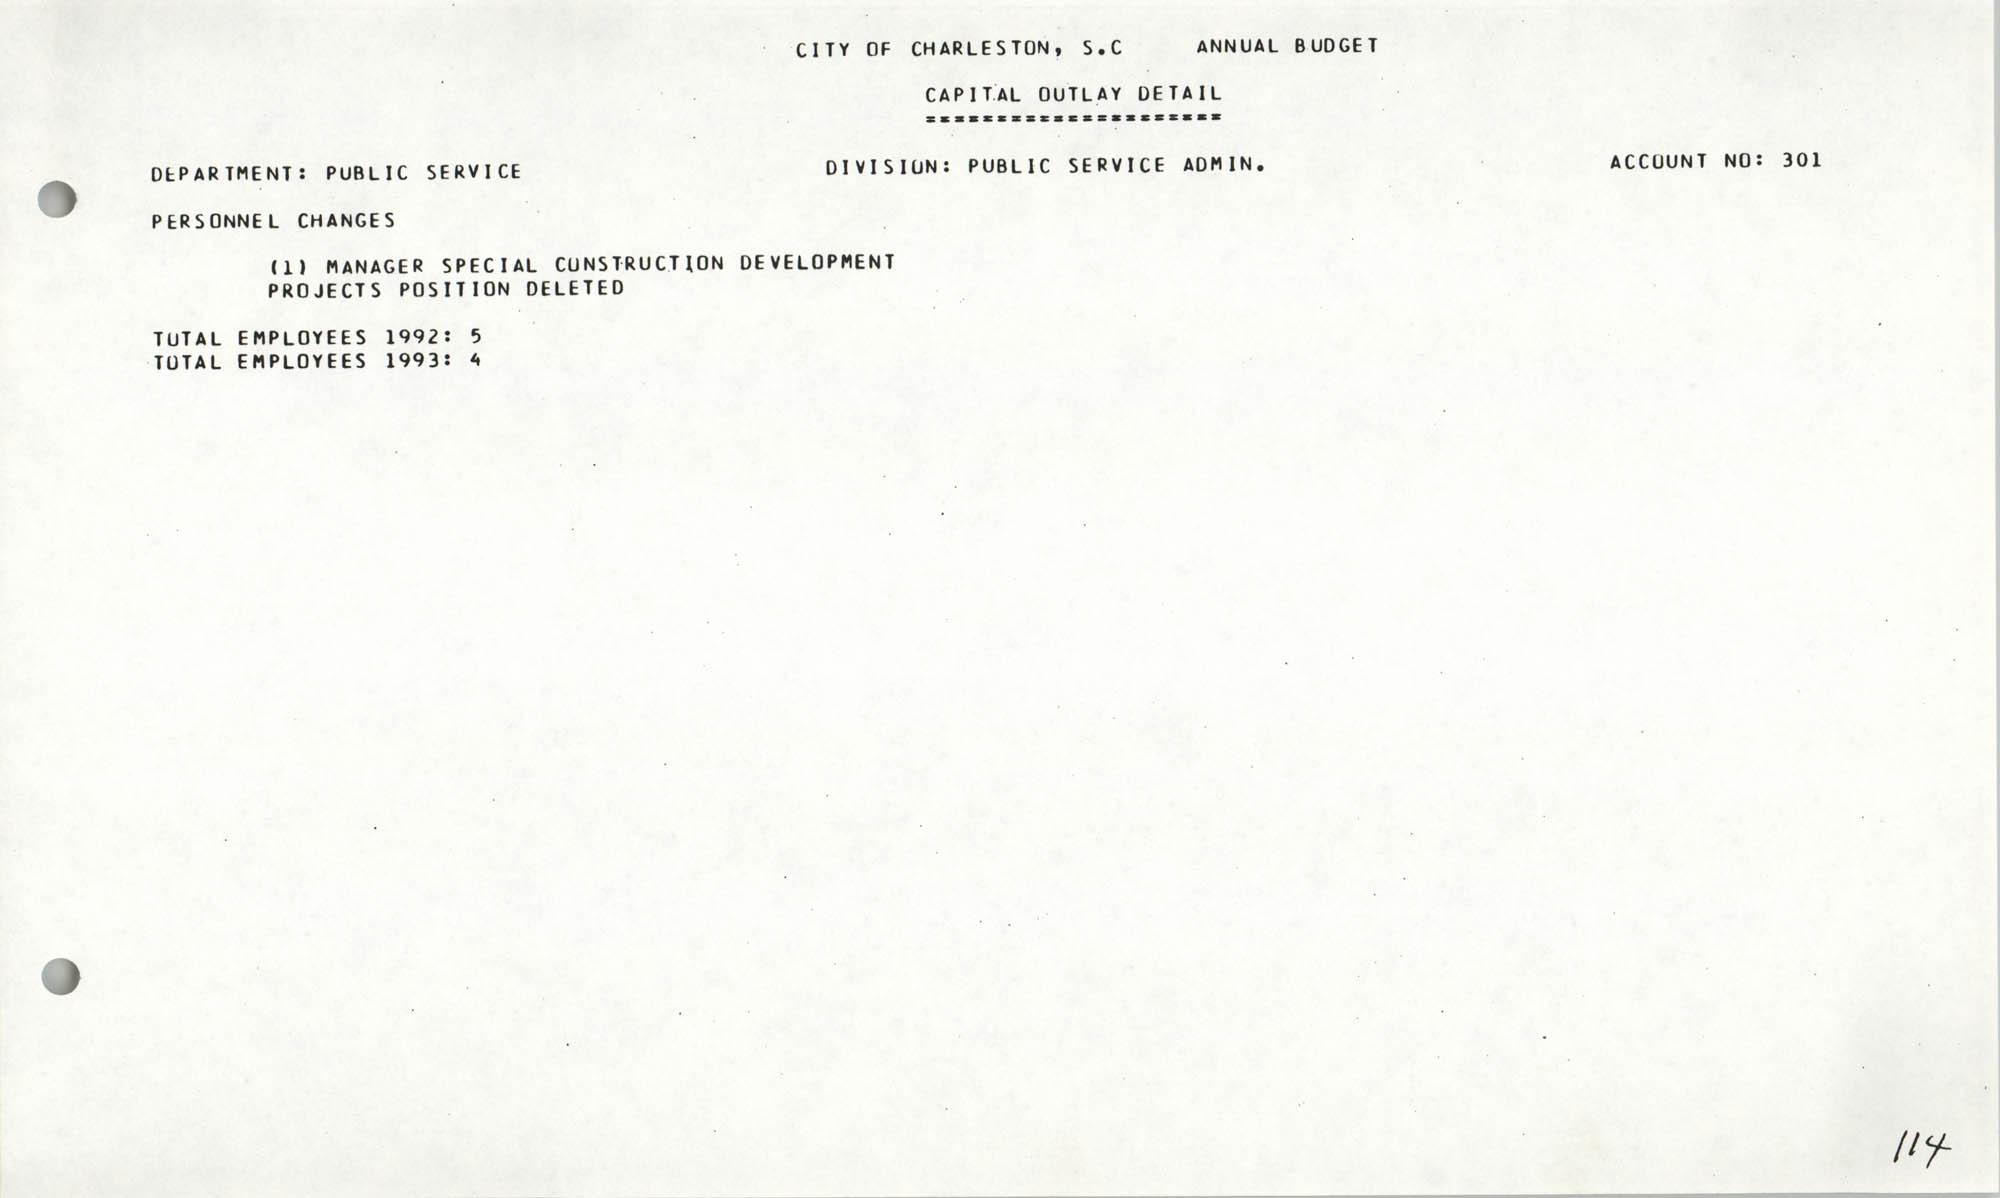 The City Council of Charleston, South Carolina, 1993 Budget, Page 114